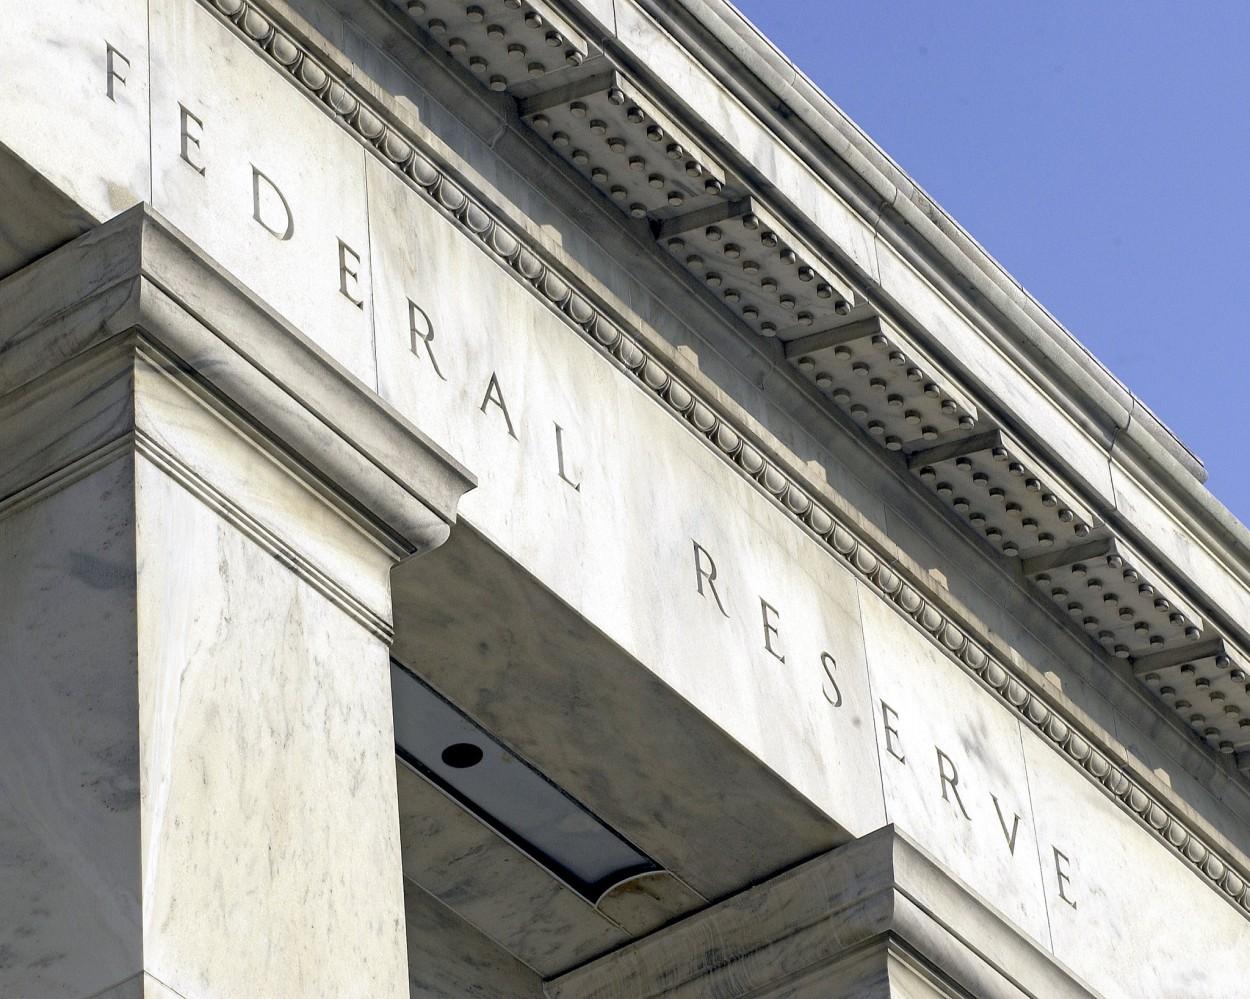 merkez bankalari dijital parasi ve parasal sistemler uzerine